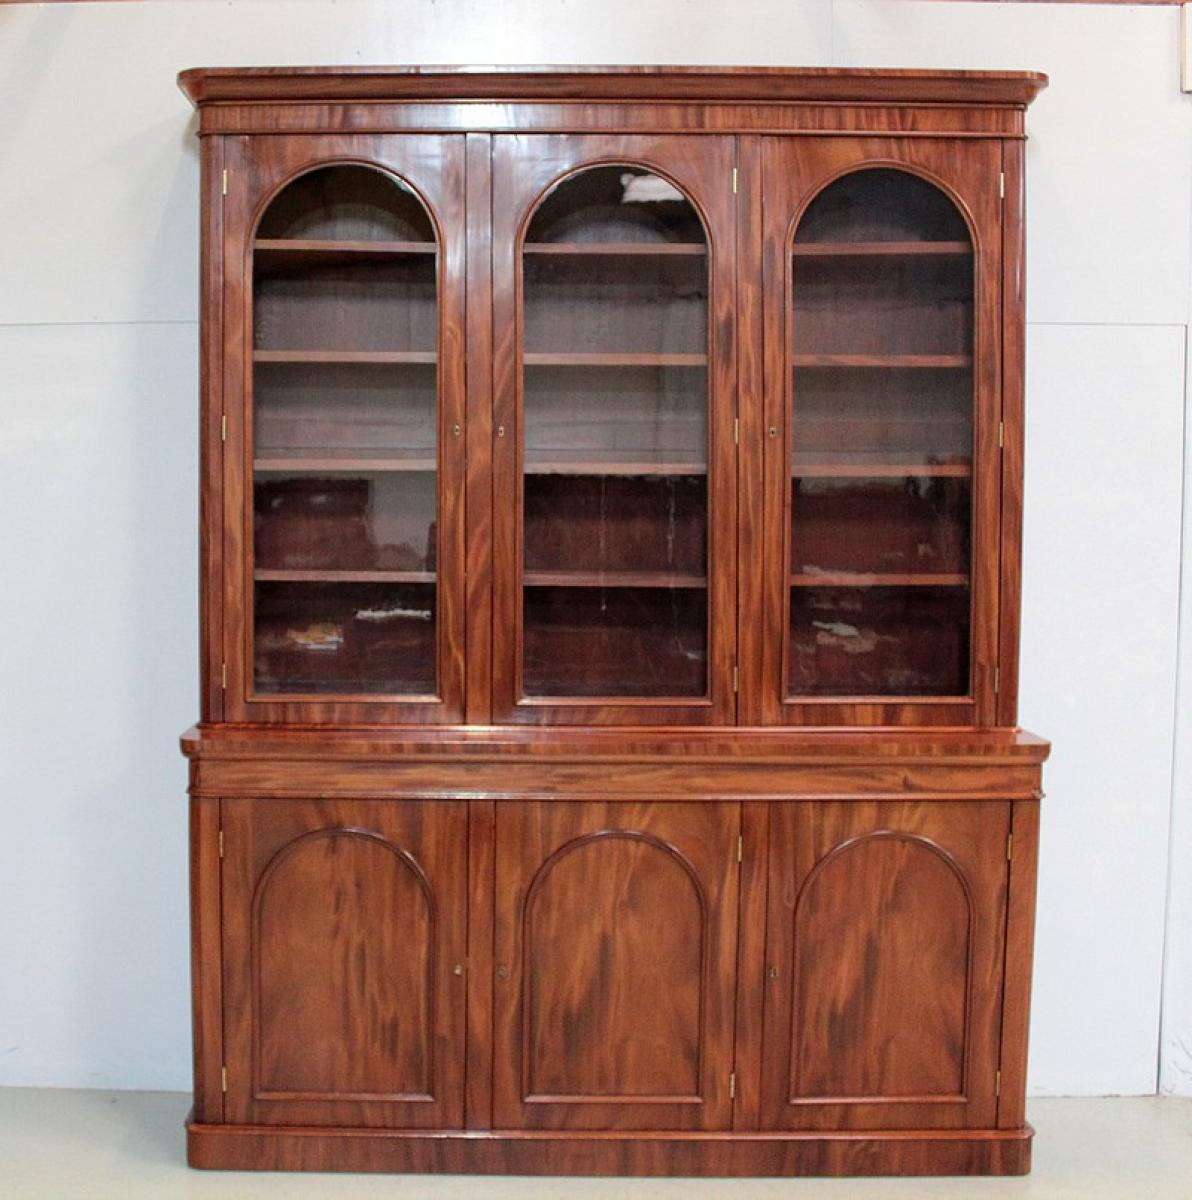 biblioth que en acajou angleterre xixe antiquites lecomte. Black Bedroom Furniture Sets. Home Design Ideas